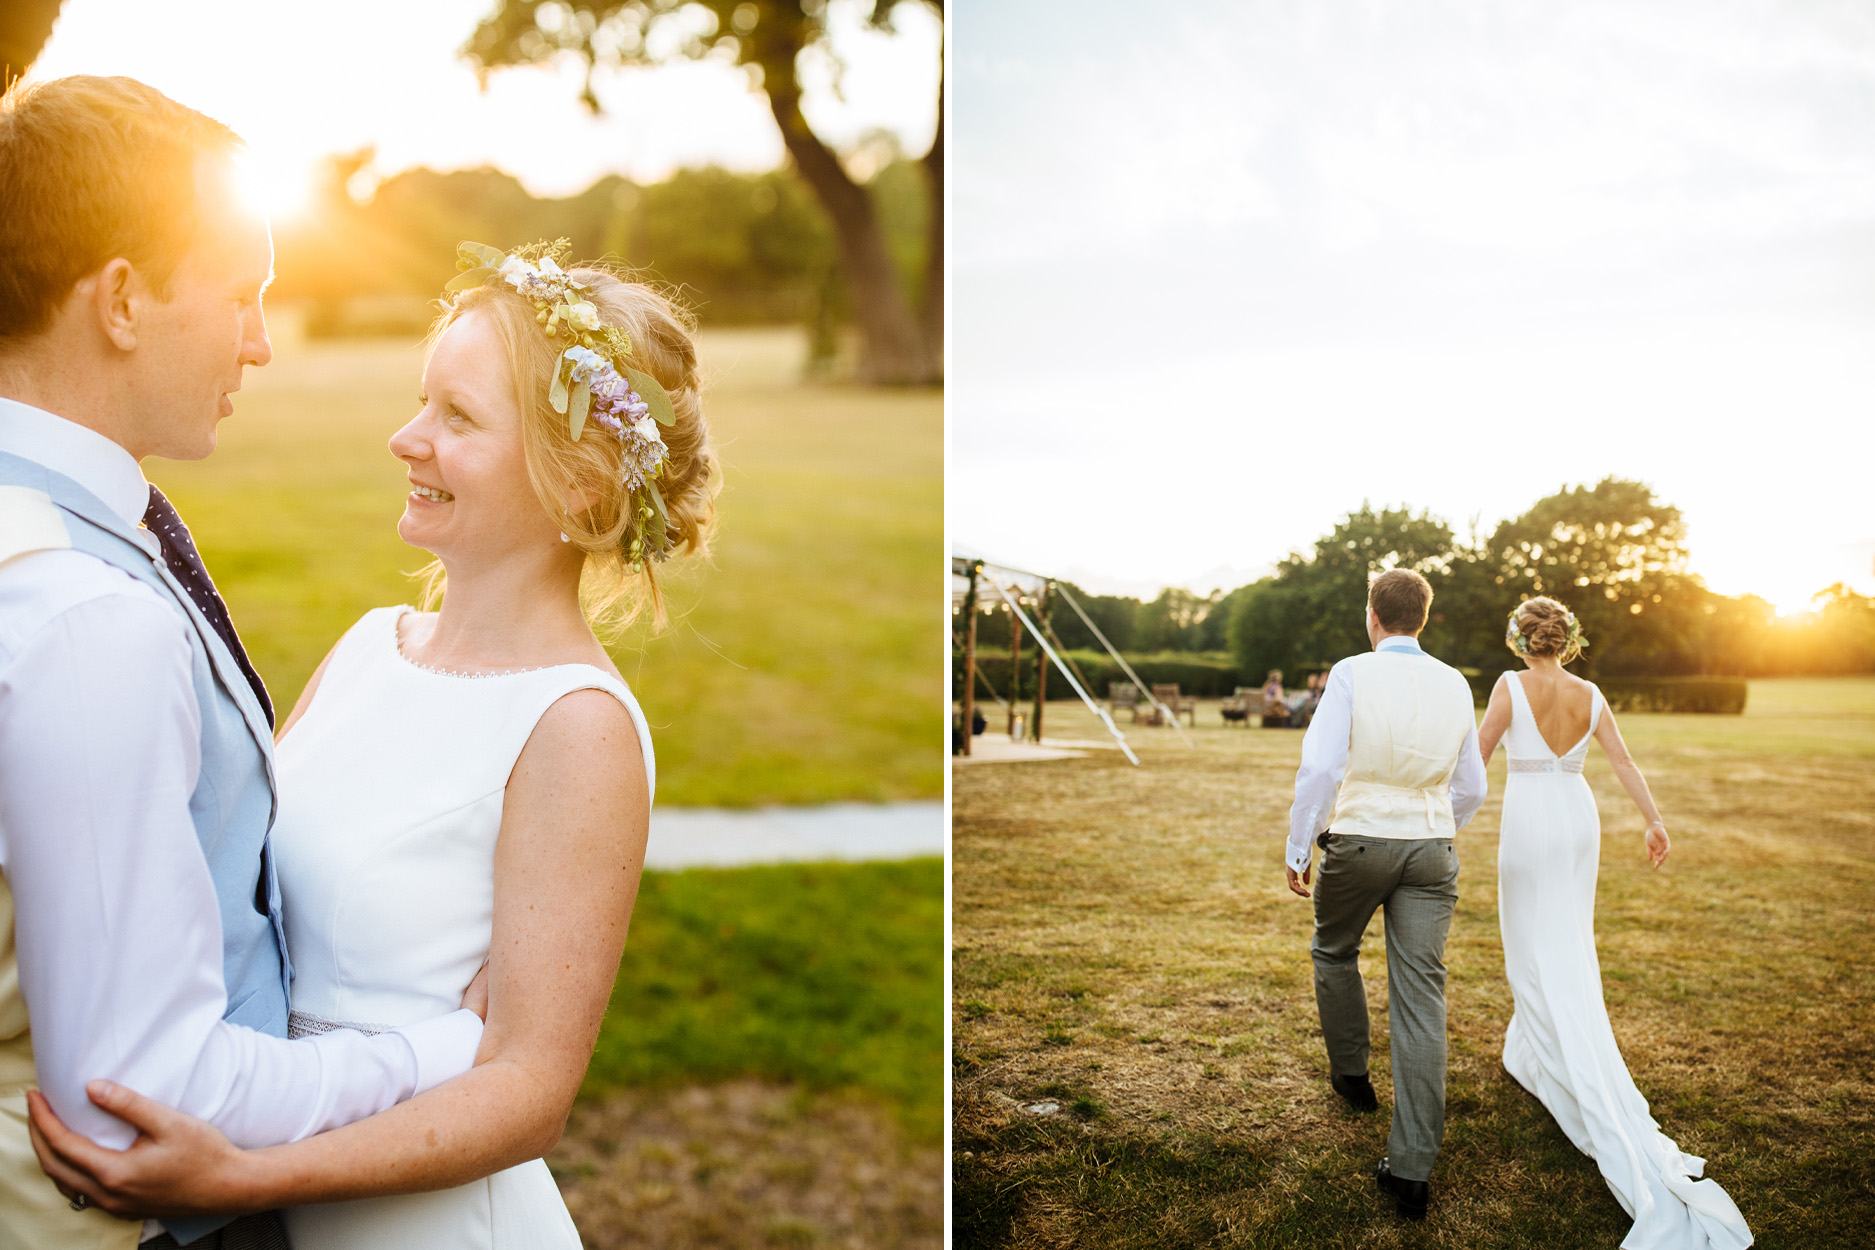 bride in flower crown at sunset at Kent festival wedding